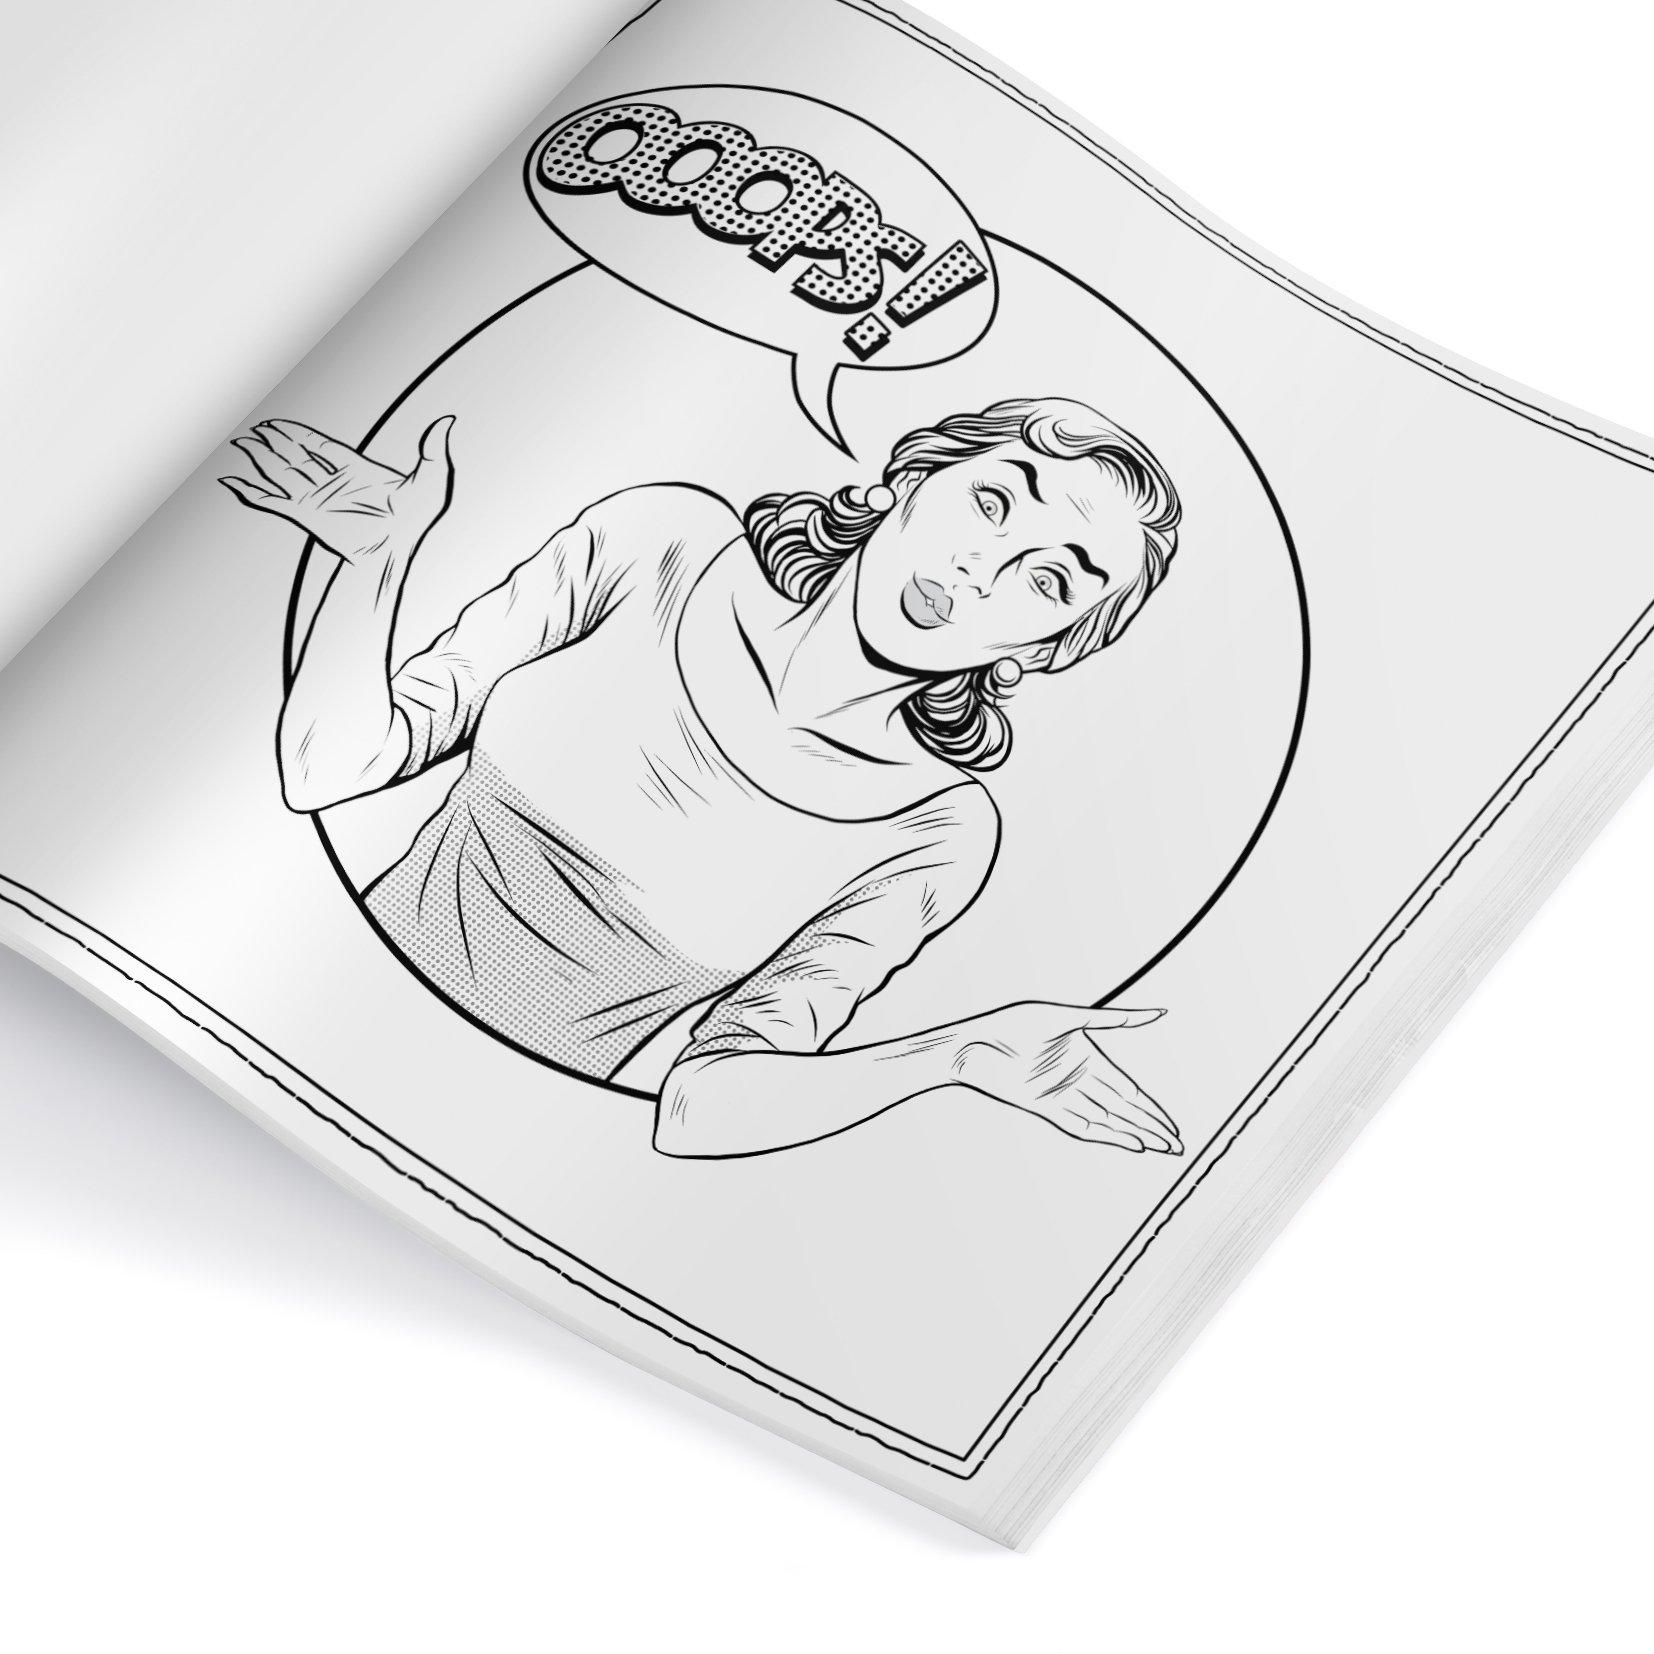 Malbuch Fur Erwachsene Trendigen Art Style Download Gallery - Ebooks ...